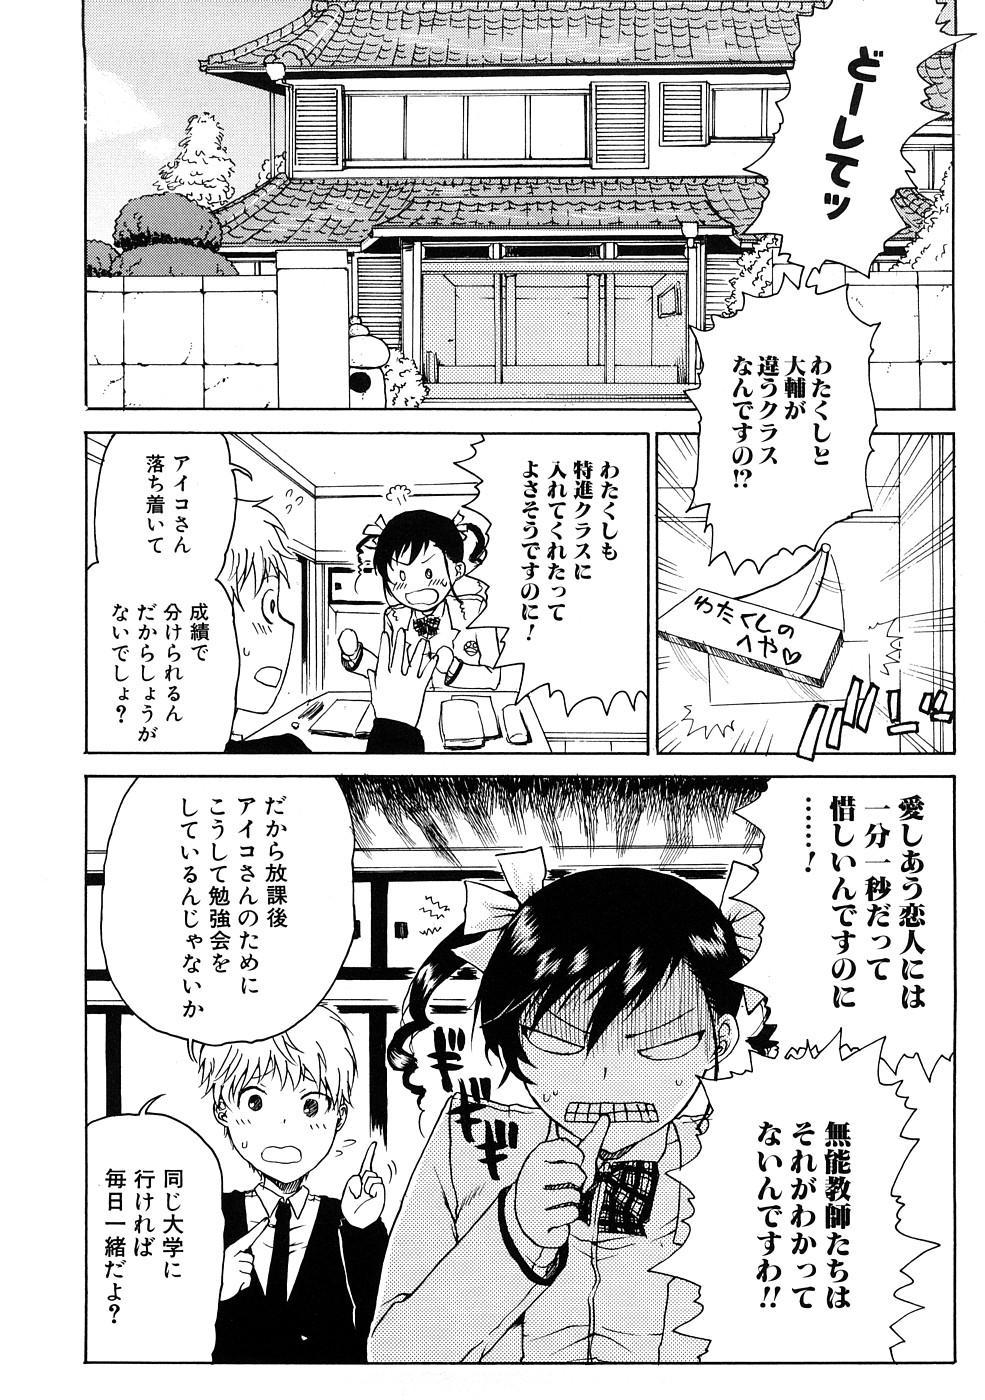 Ecchi de Jibunkatte de Kawaii Ko 37